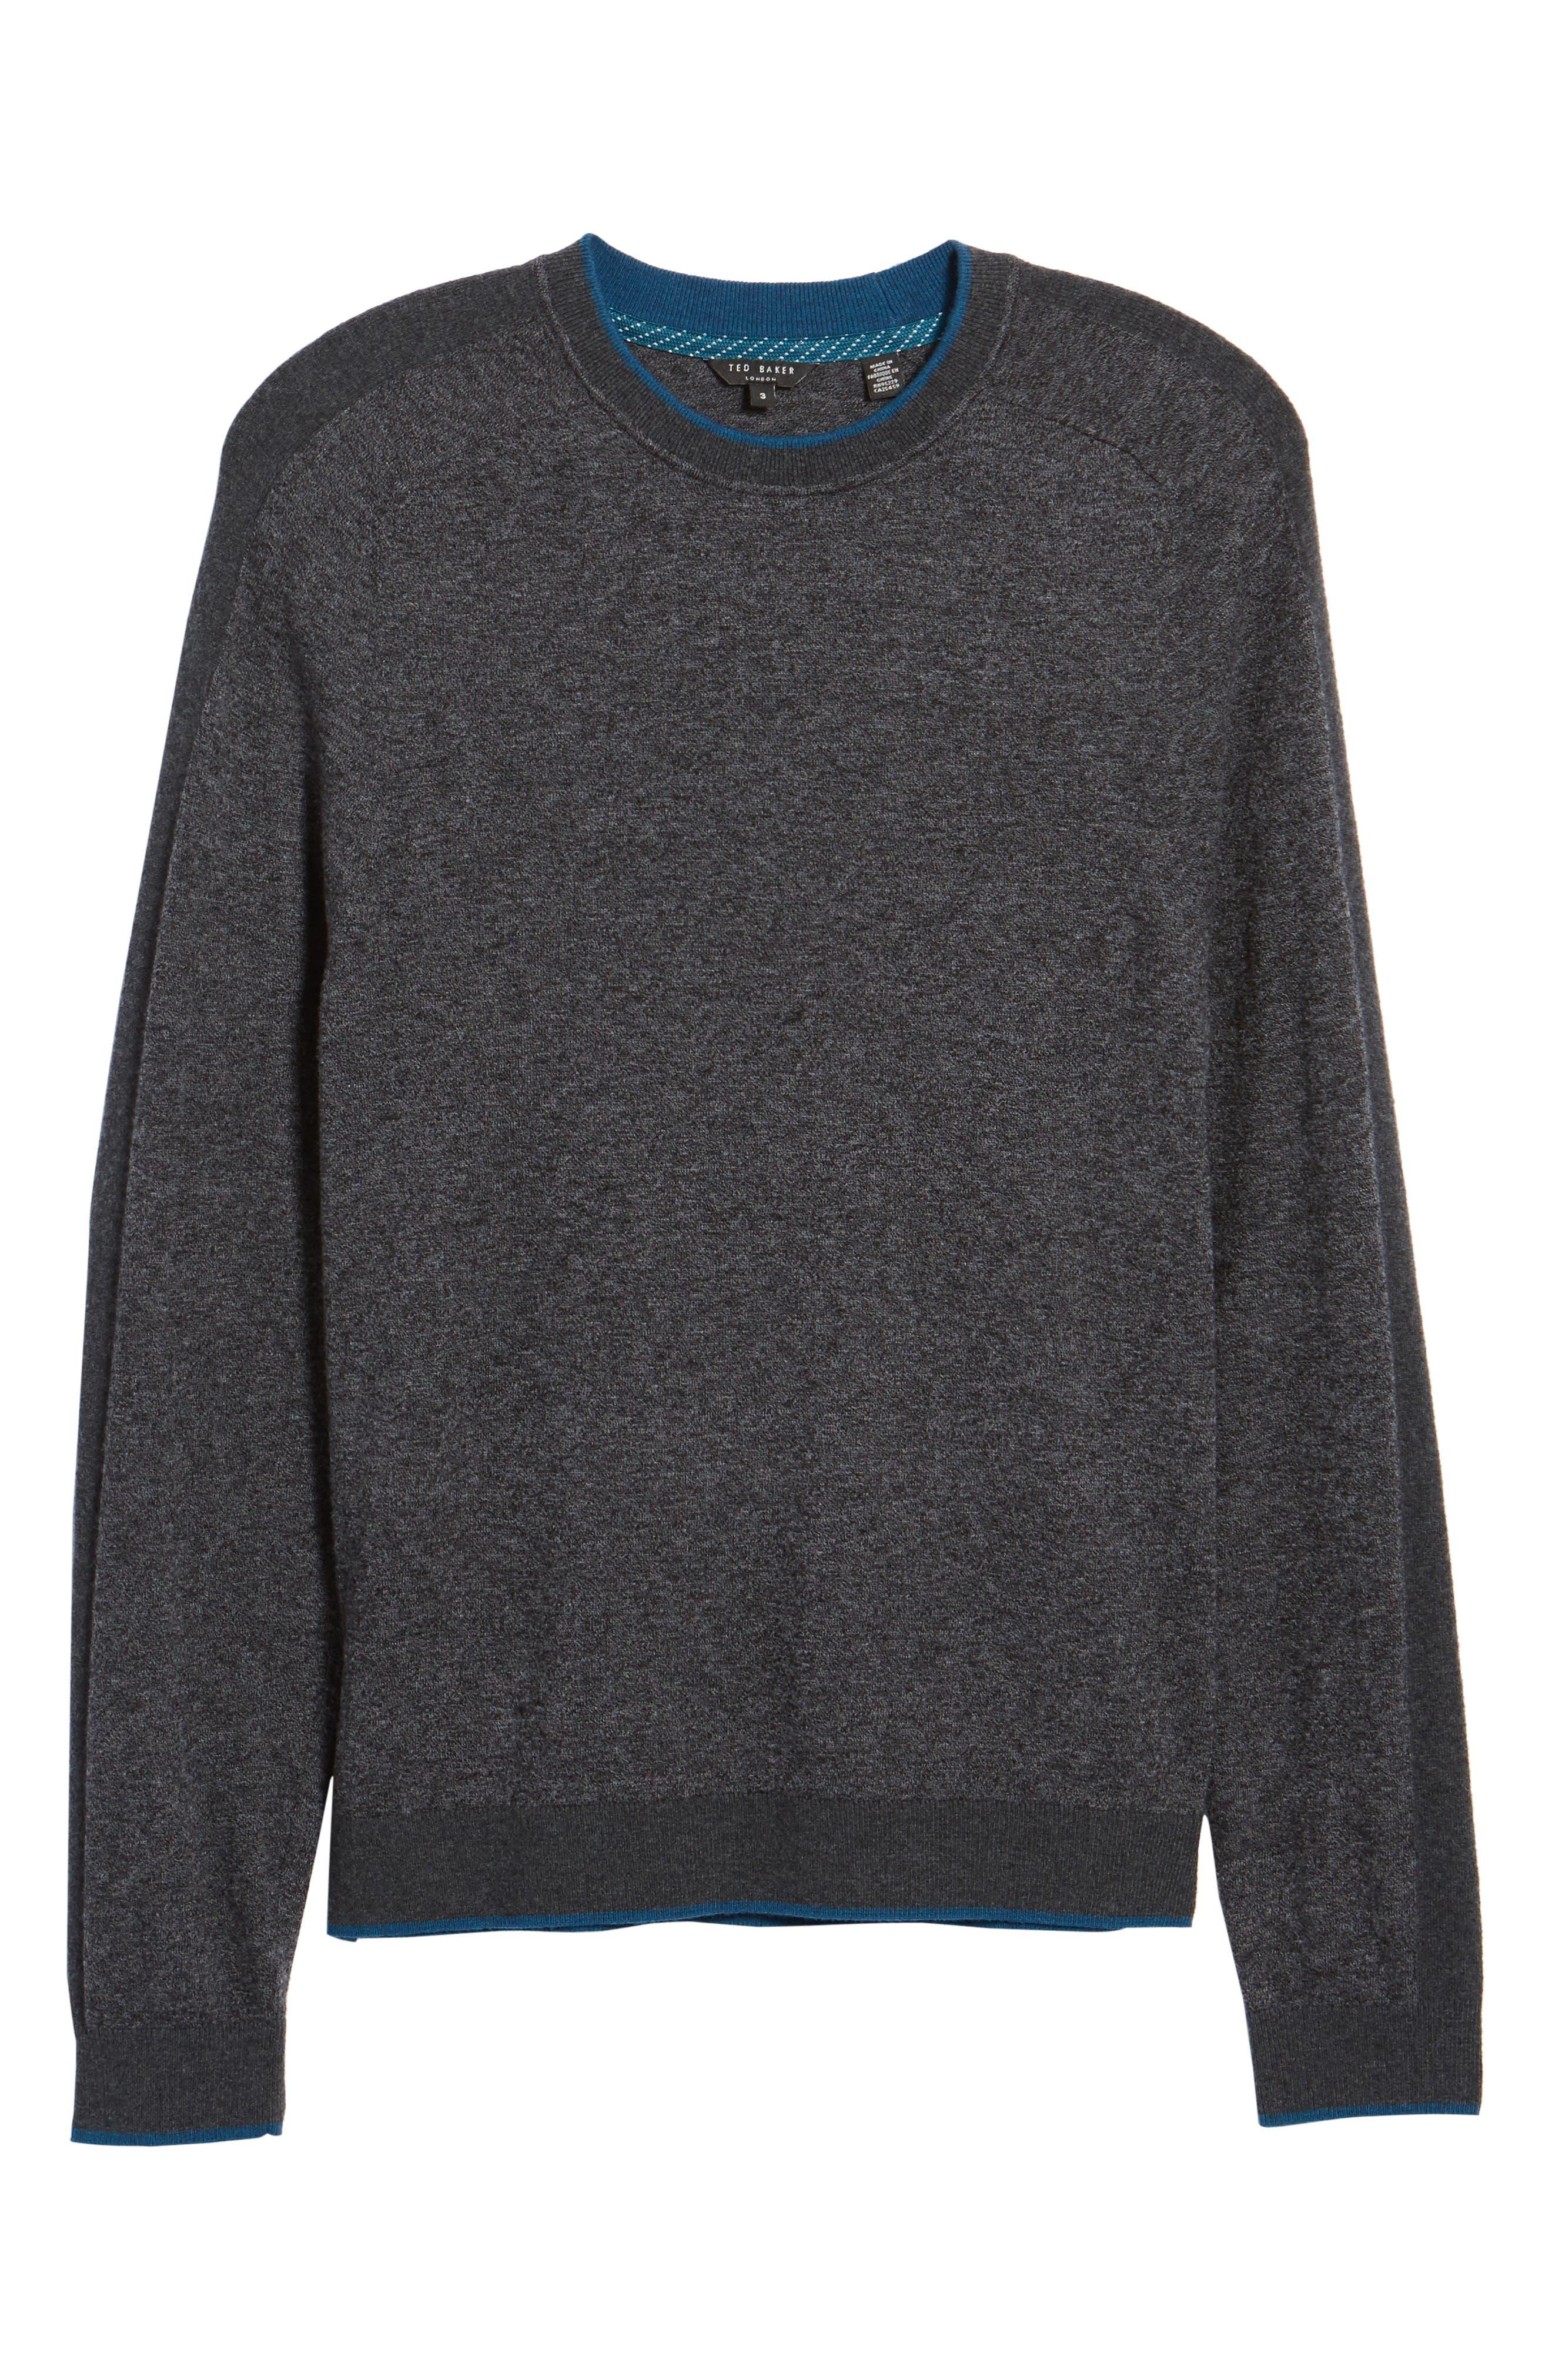 Norpol Crewneck Sweater,                             Alternate thumbnail 21, color,